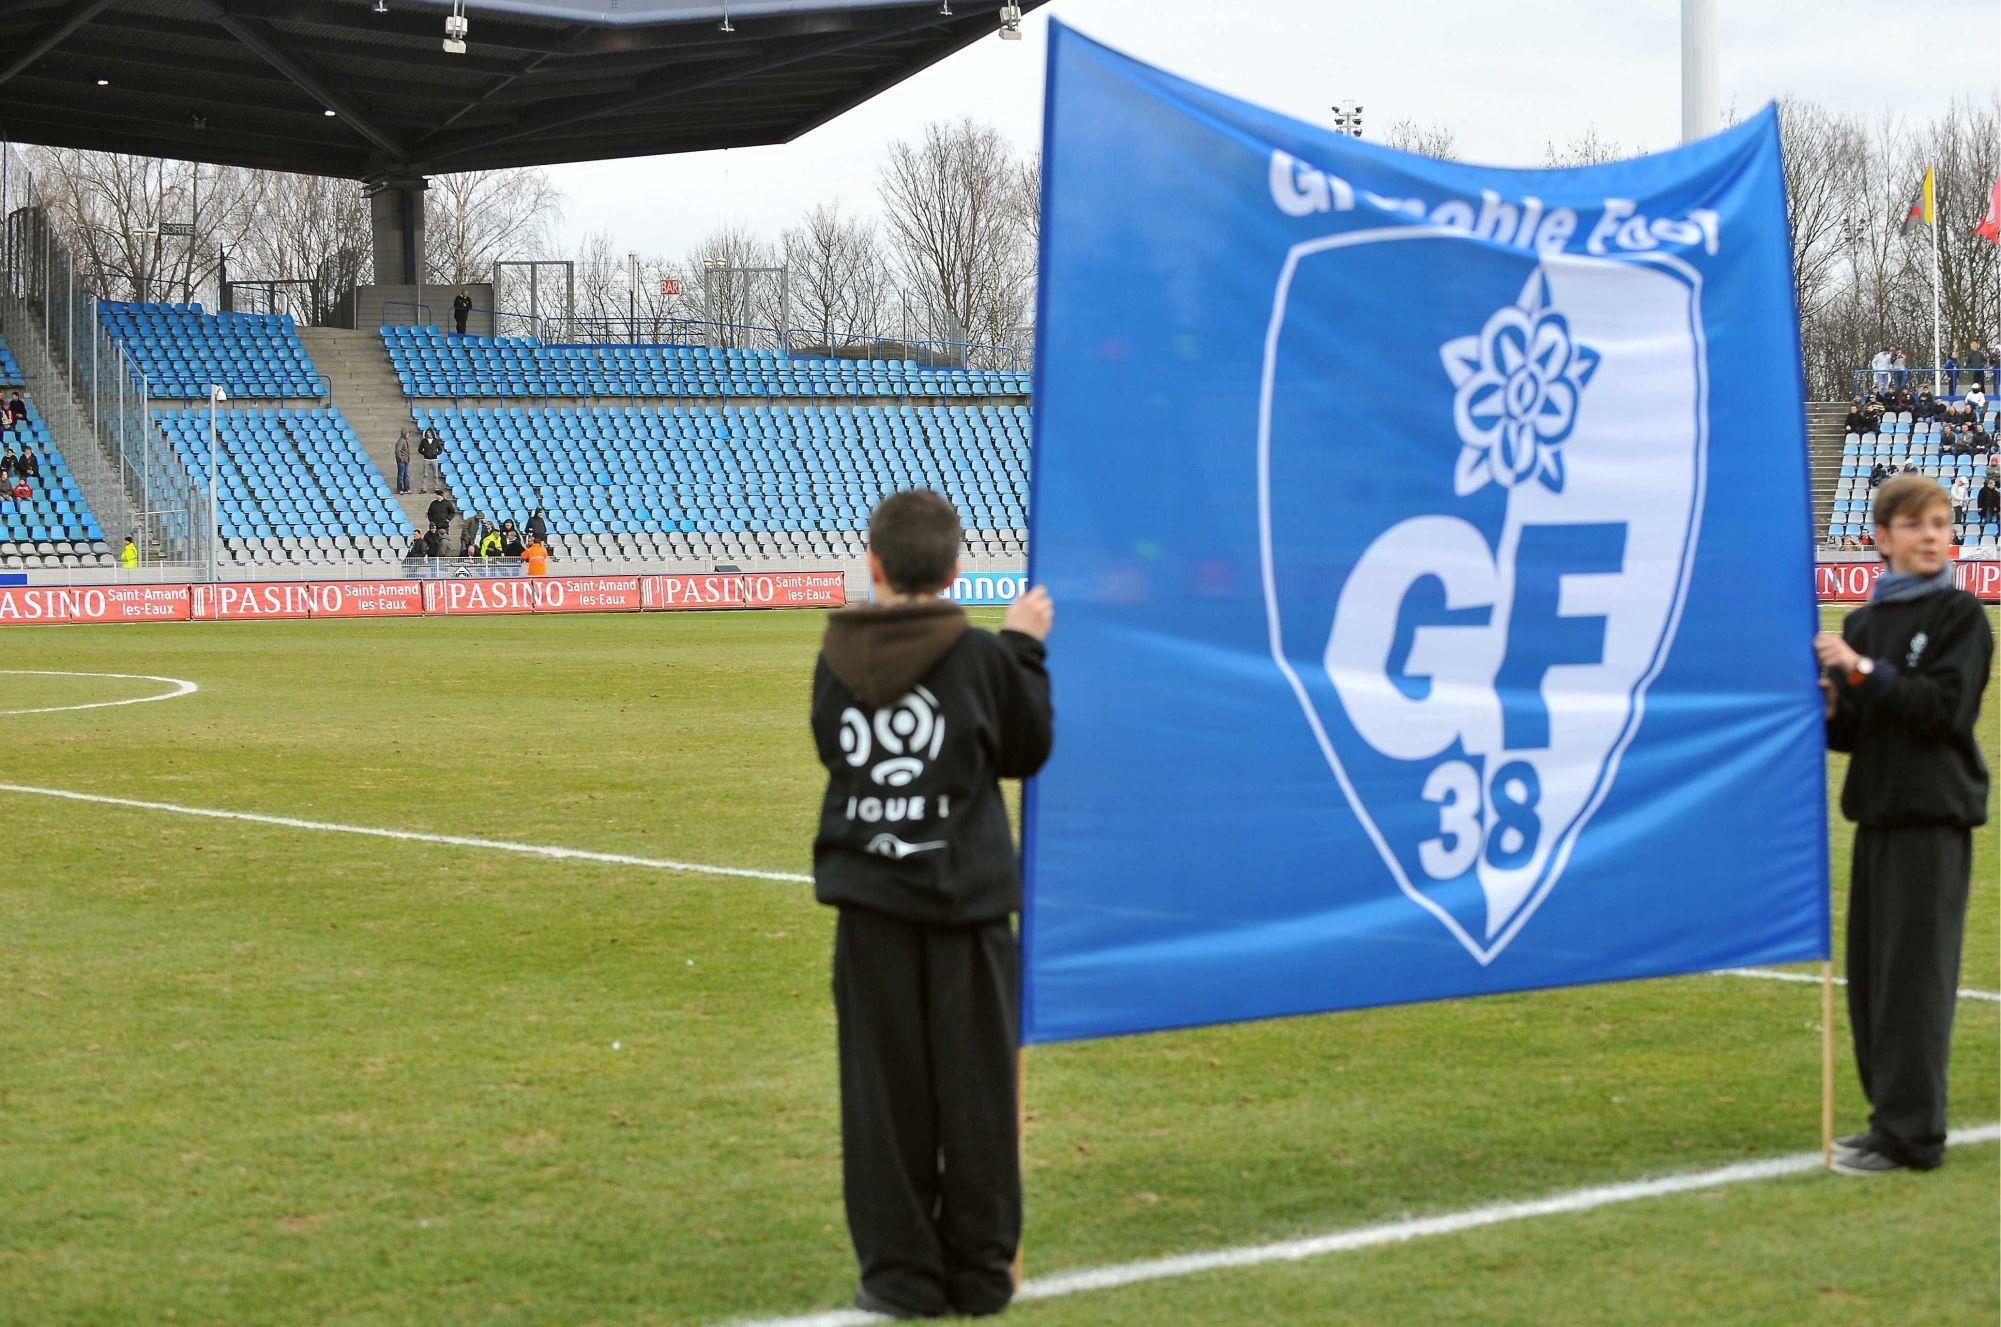 Le compte twitter du Grenoble Foot chambre les supporters caennais